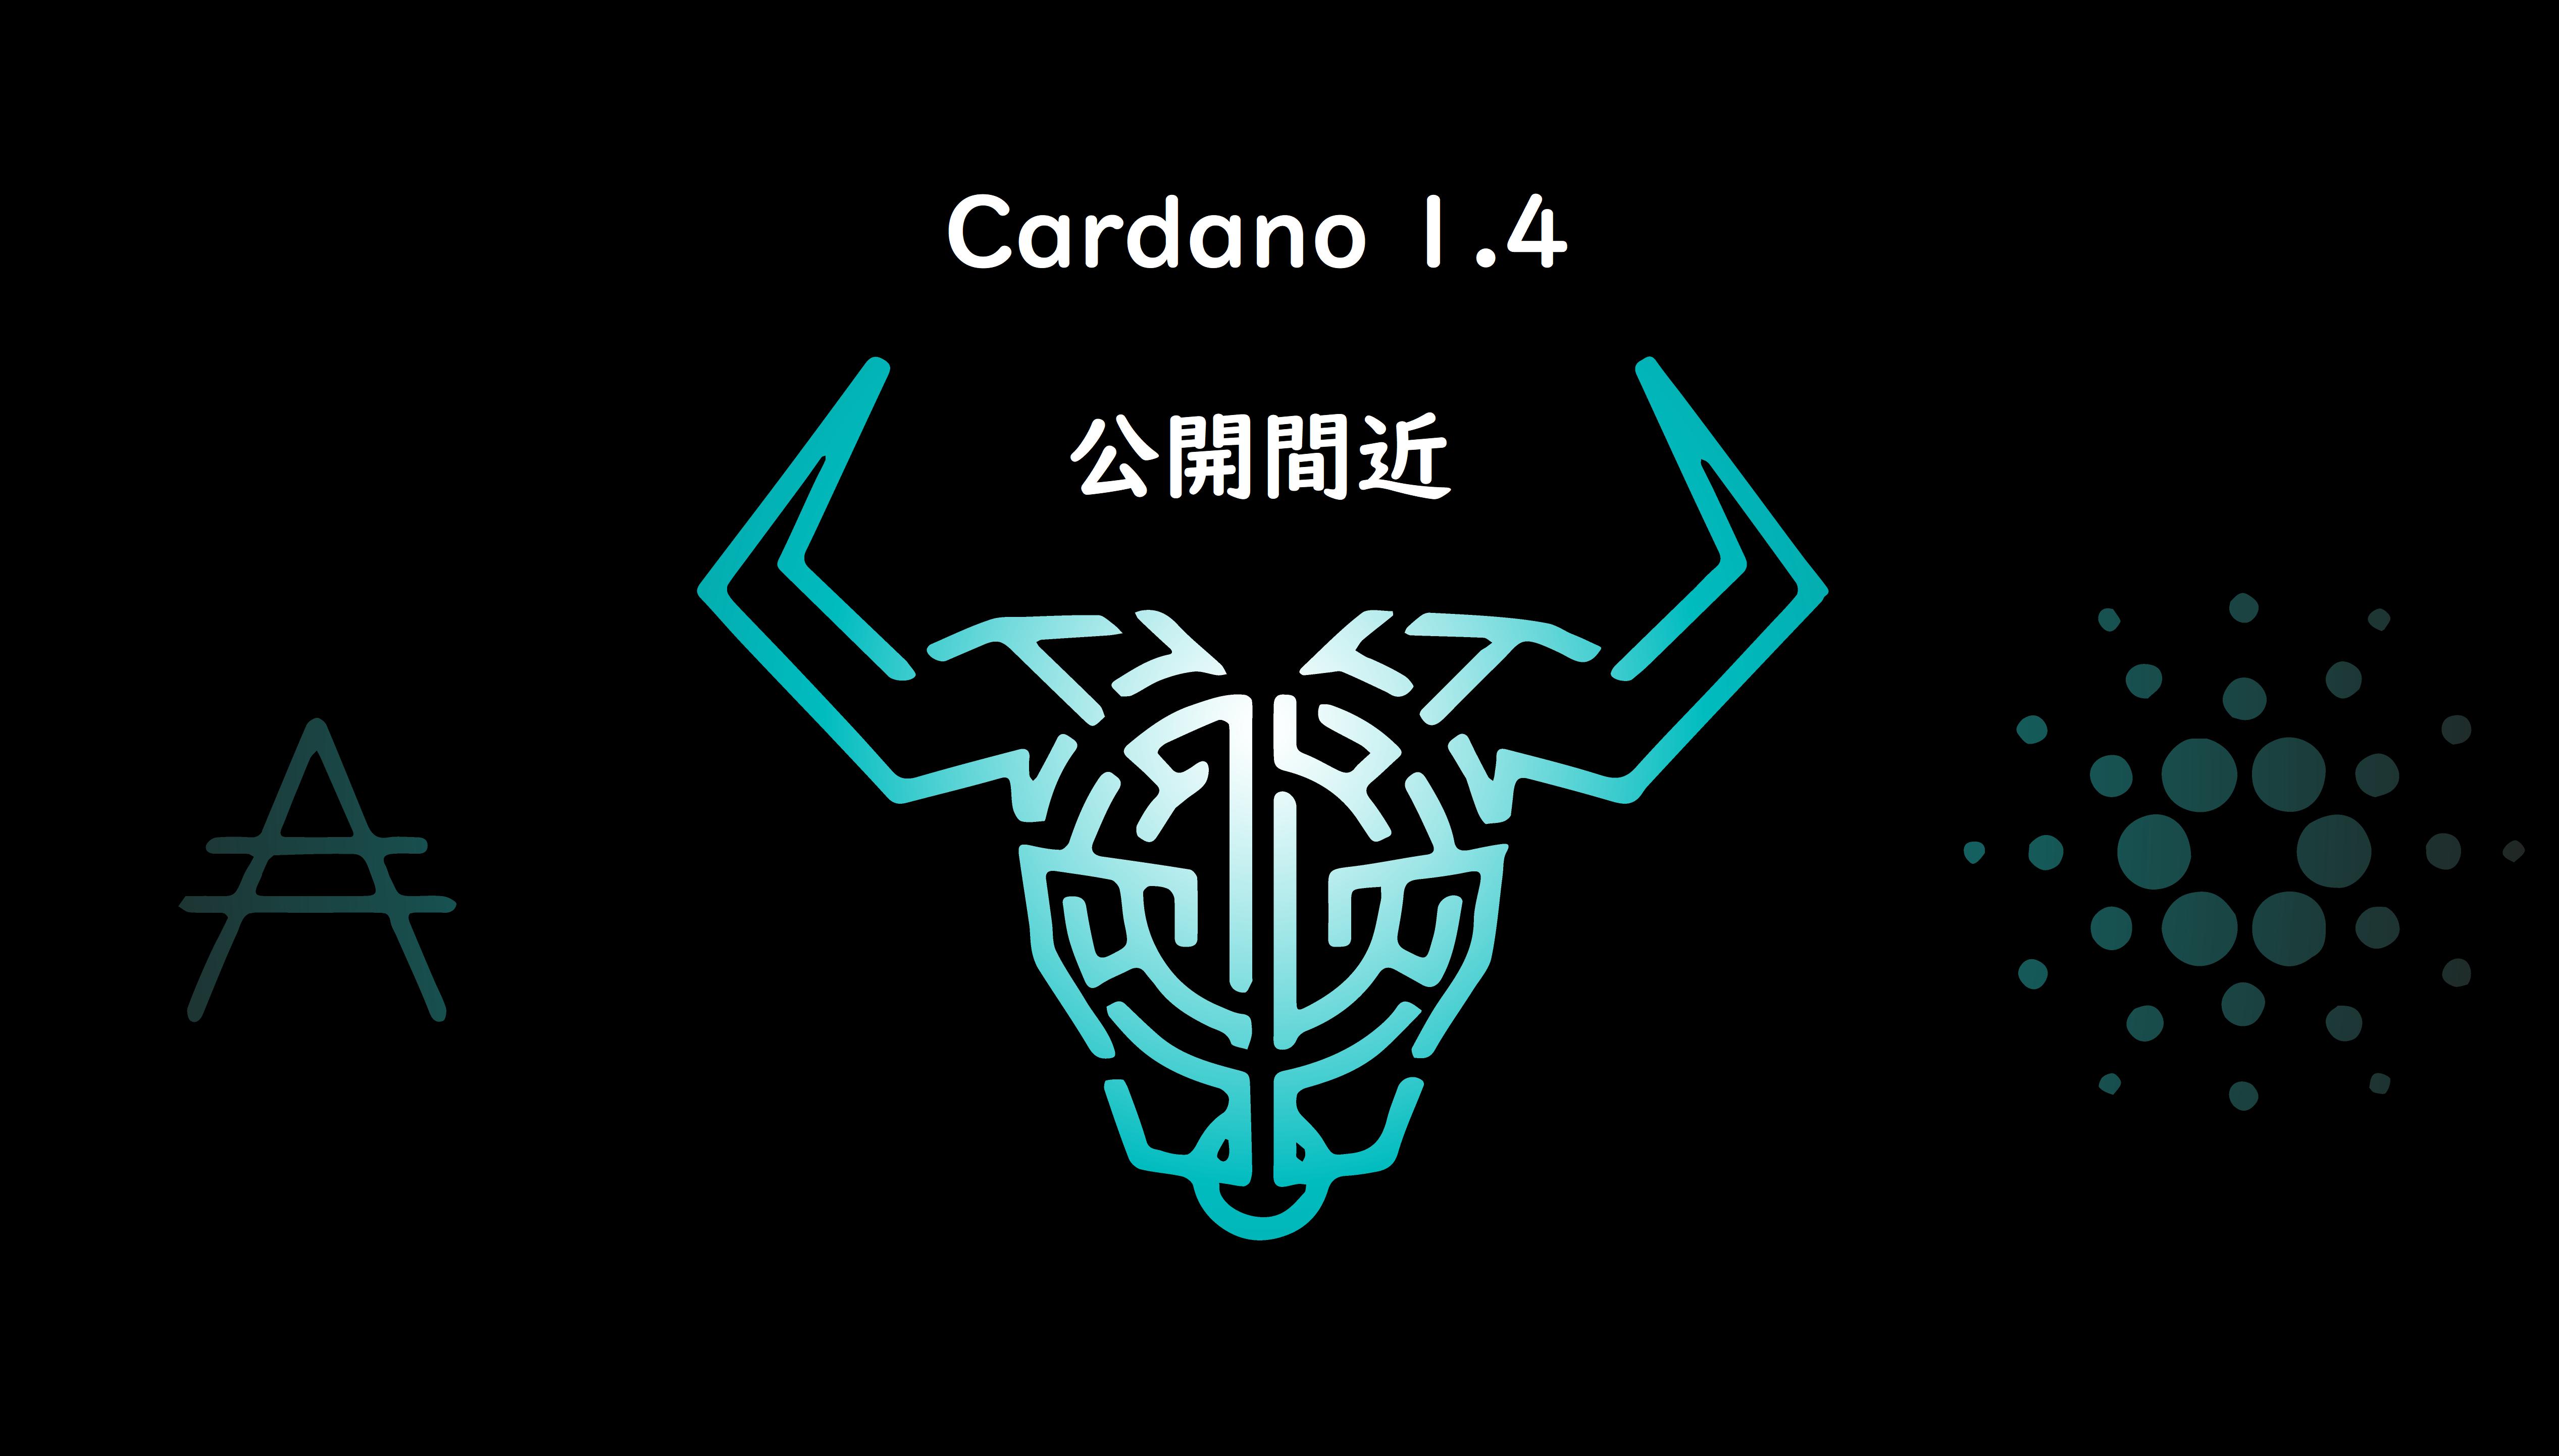 cardano-sl-1-4